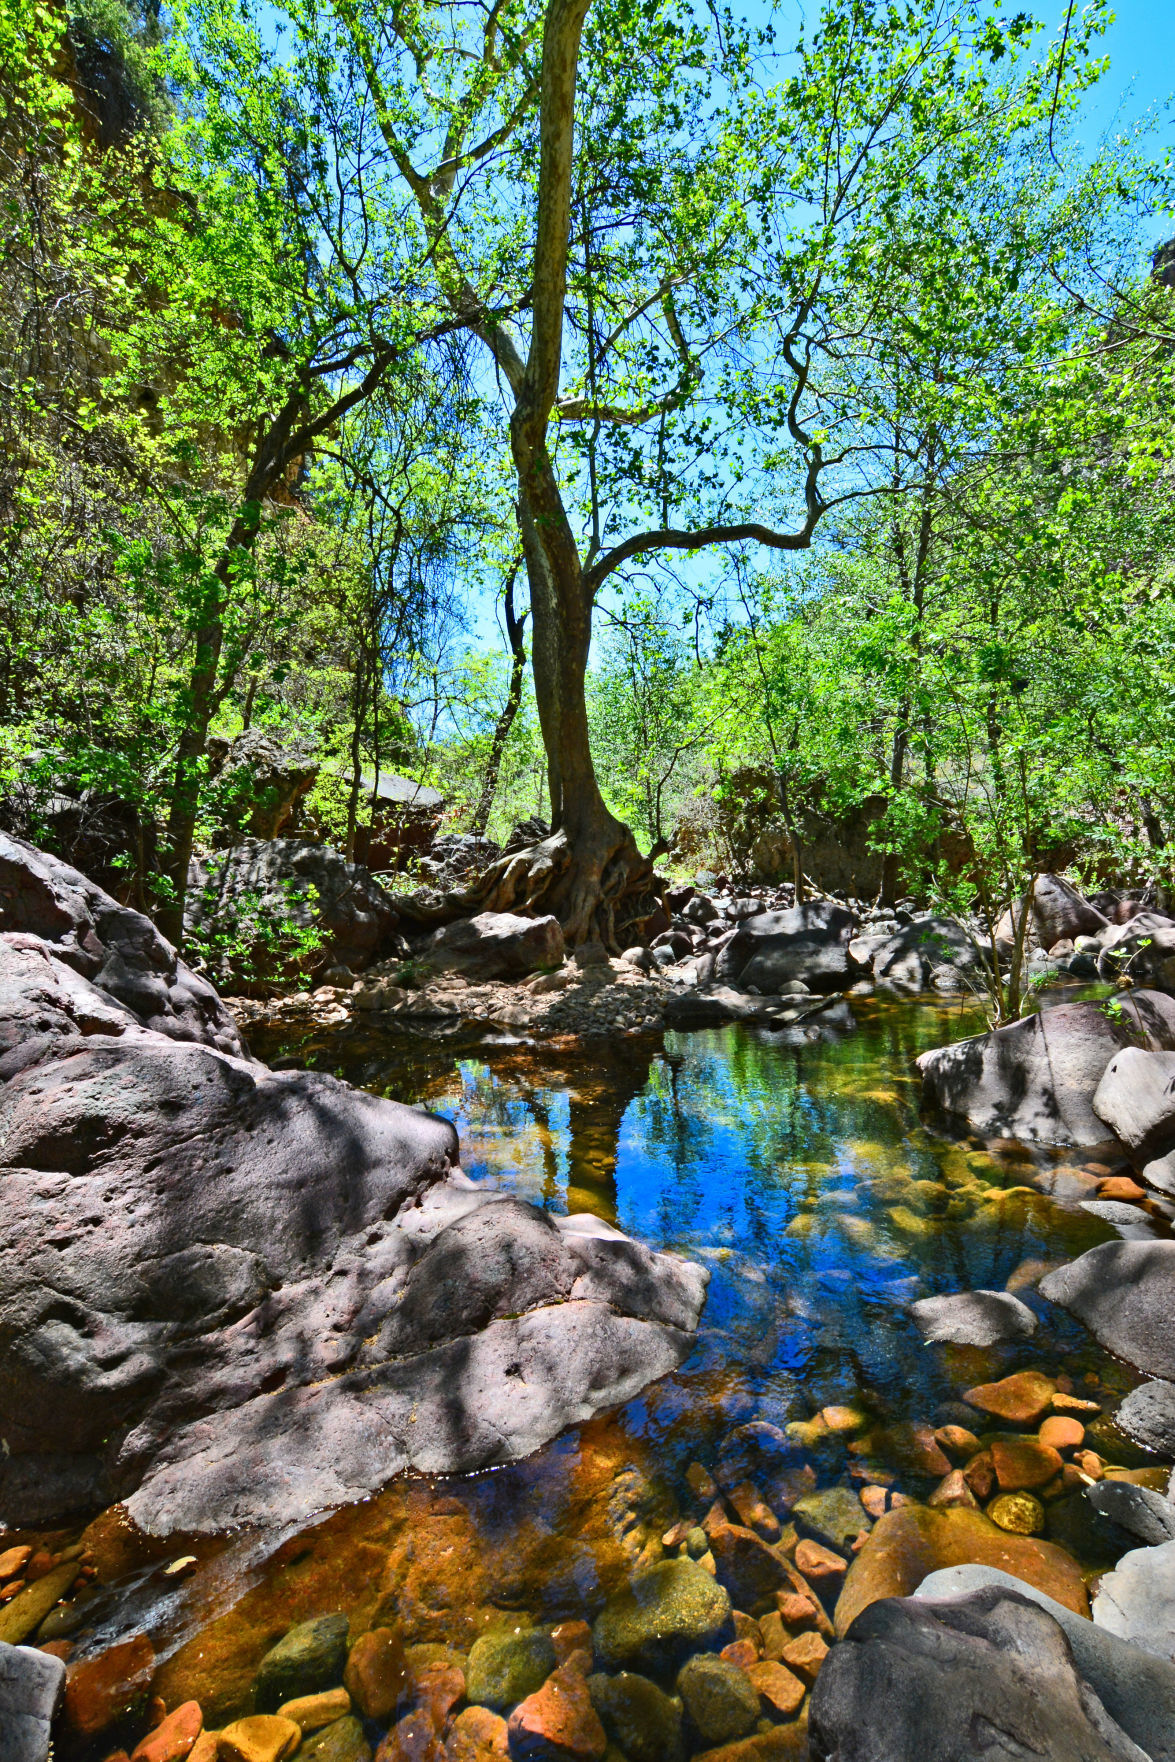 Pine Creek Trail TNB DSC_6389 4K res personal photo Pia Wyer.jpg